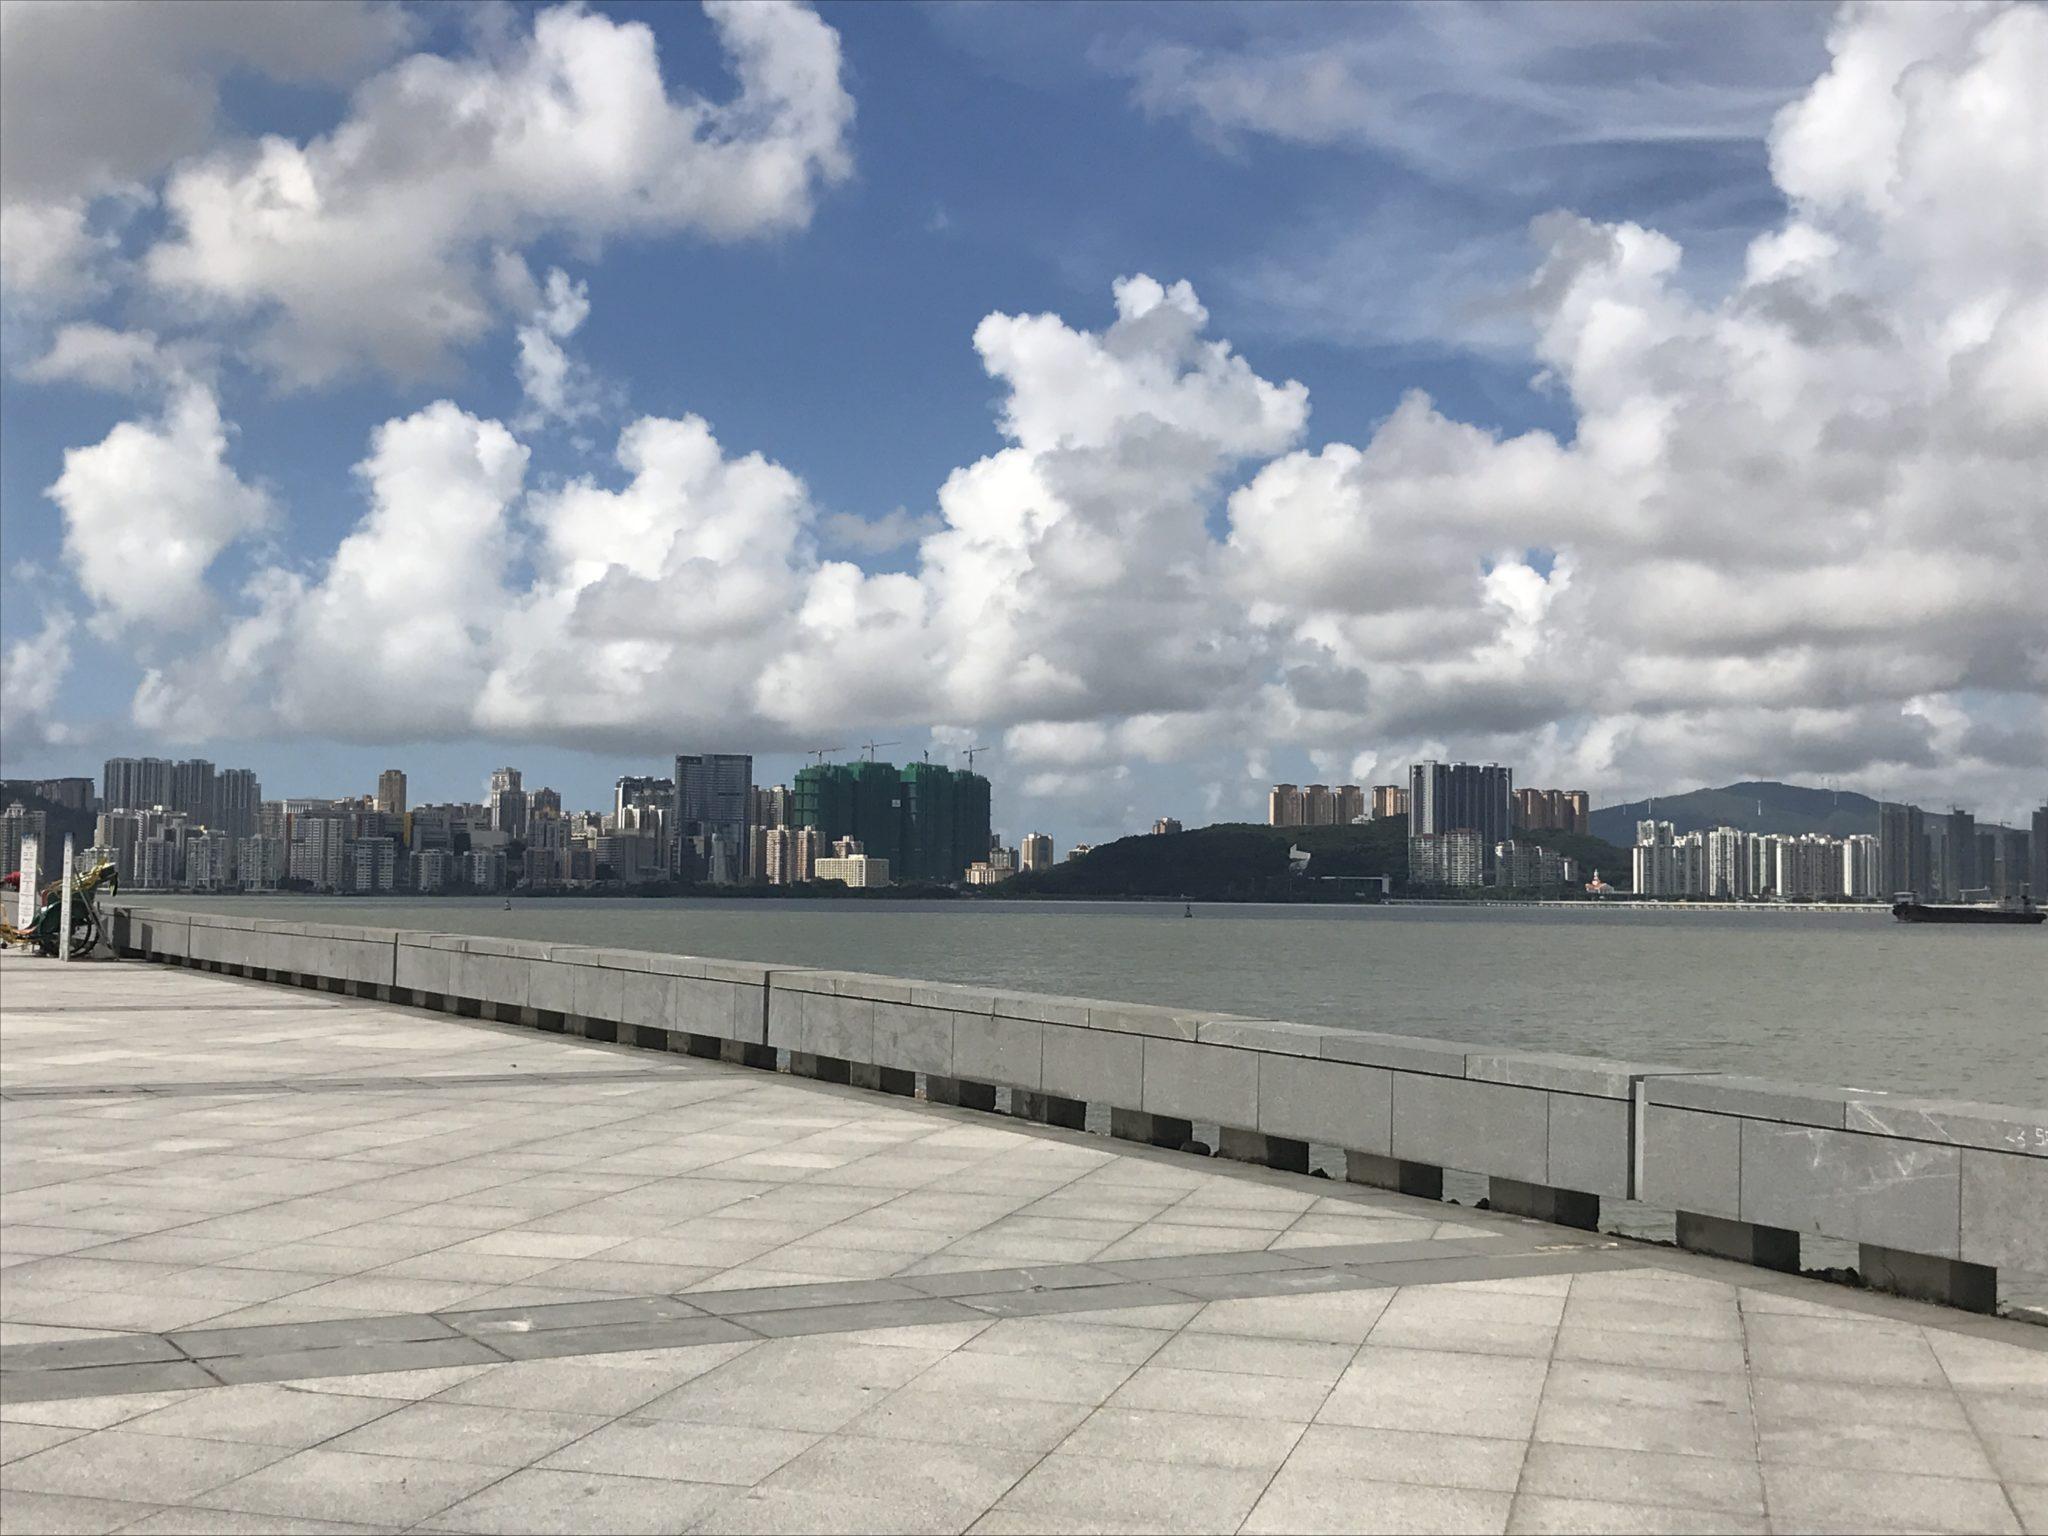 Planeamento Urbanístico | Consulta pública sobre vários projectos na cidade